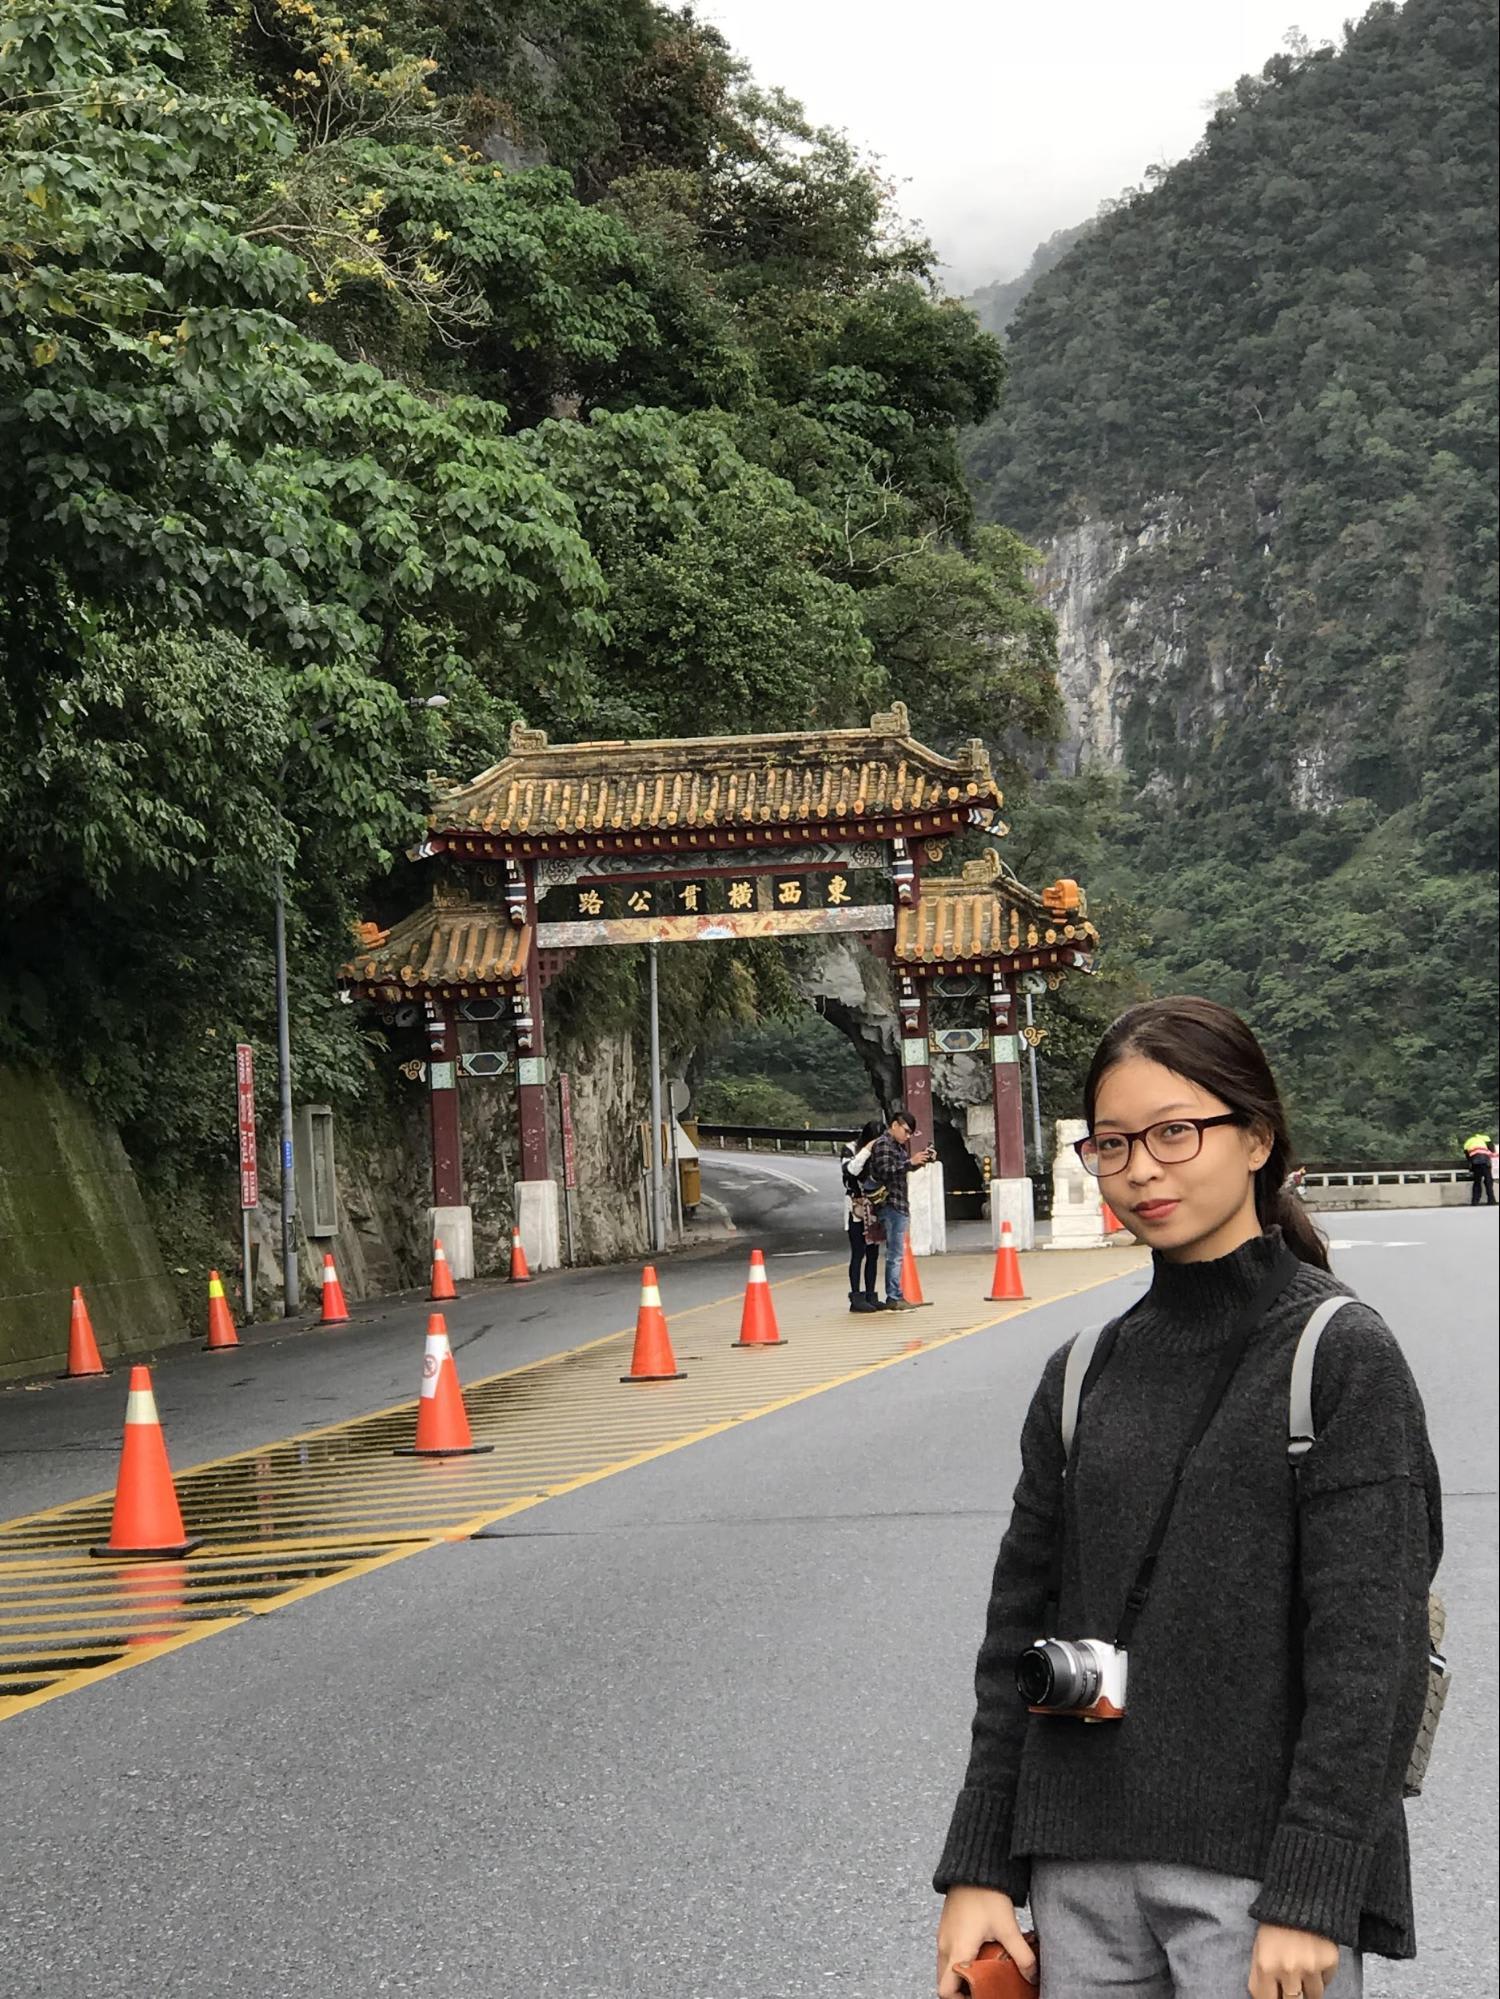 cổng chào taroko national park